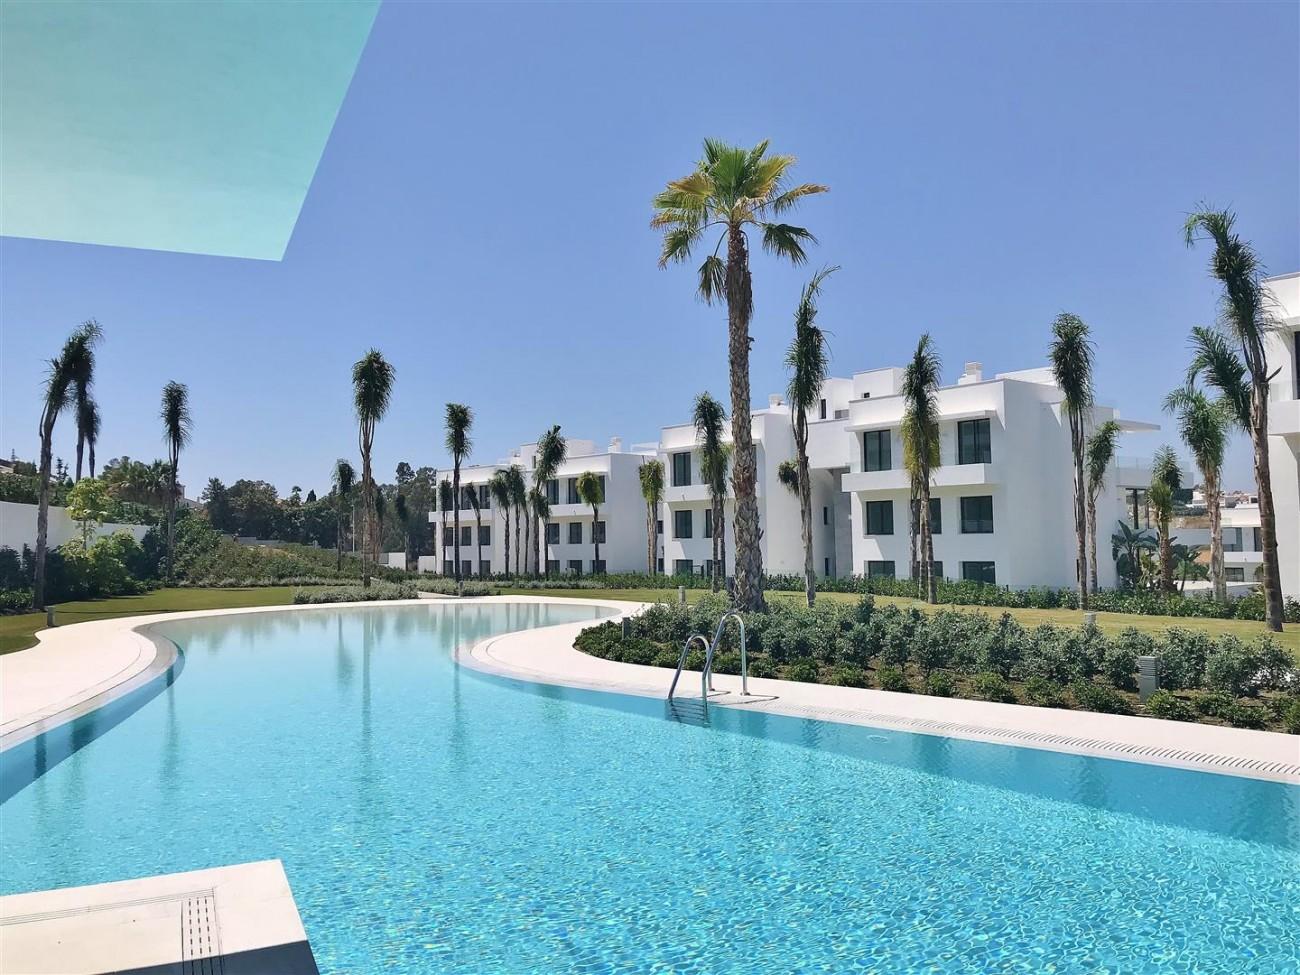 New Contemporary Apartment for sale Estepona Spain (9) (Large)